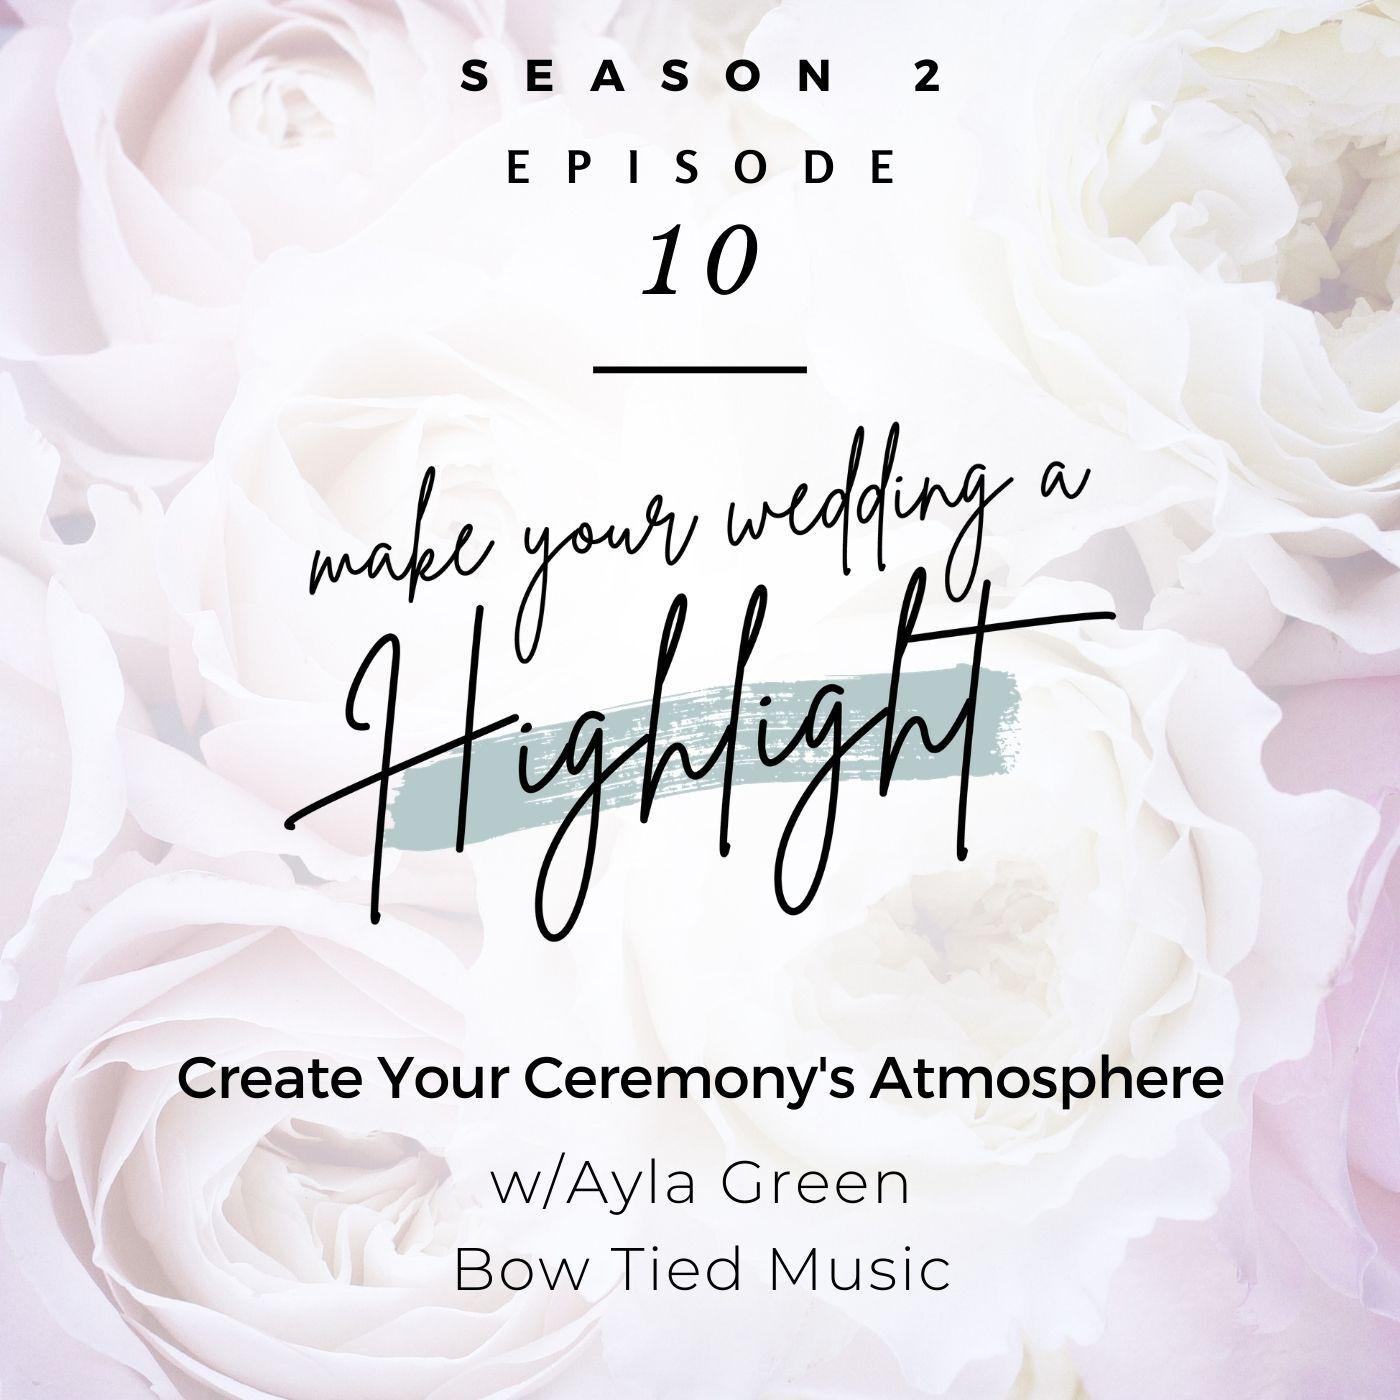 Create Your Ceremony's Atmosphere